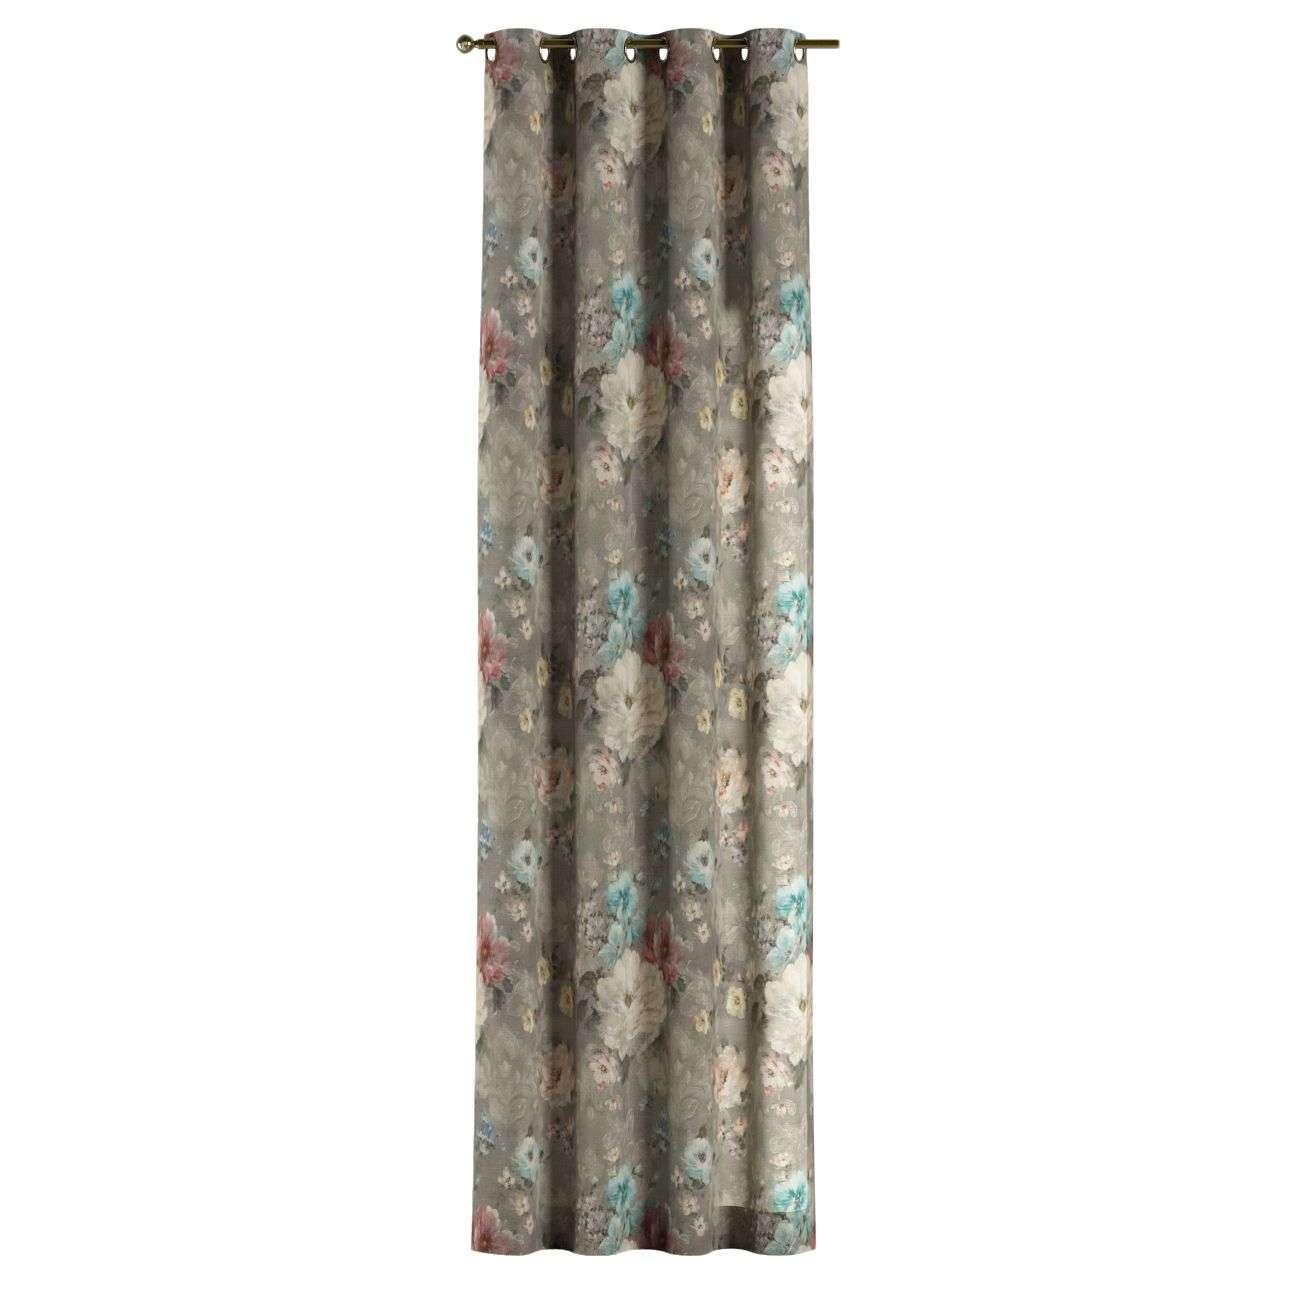 Záves s kolieskami V kolekcii Flowers, tkanina: 137-81